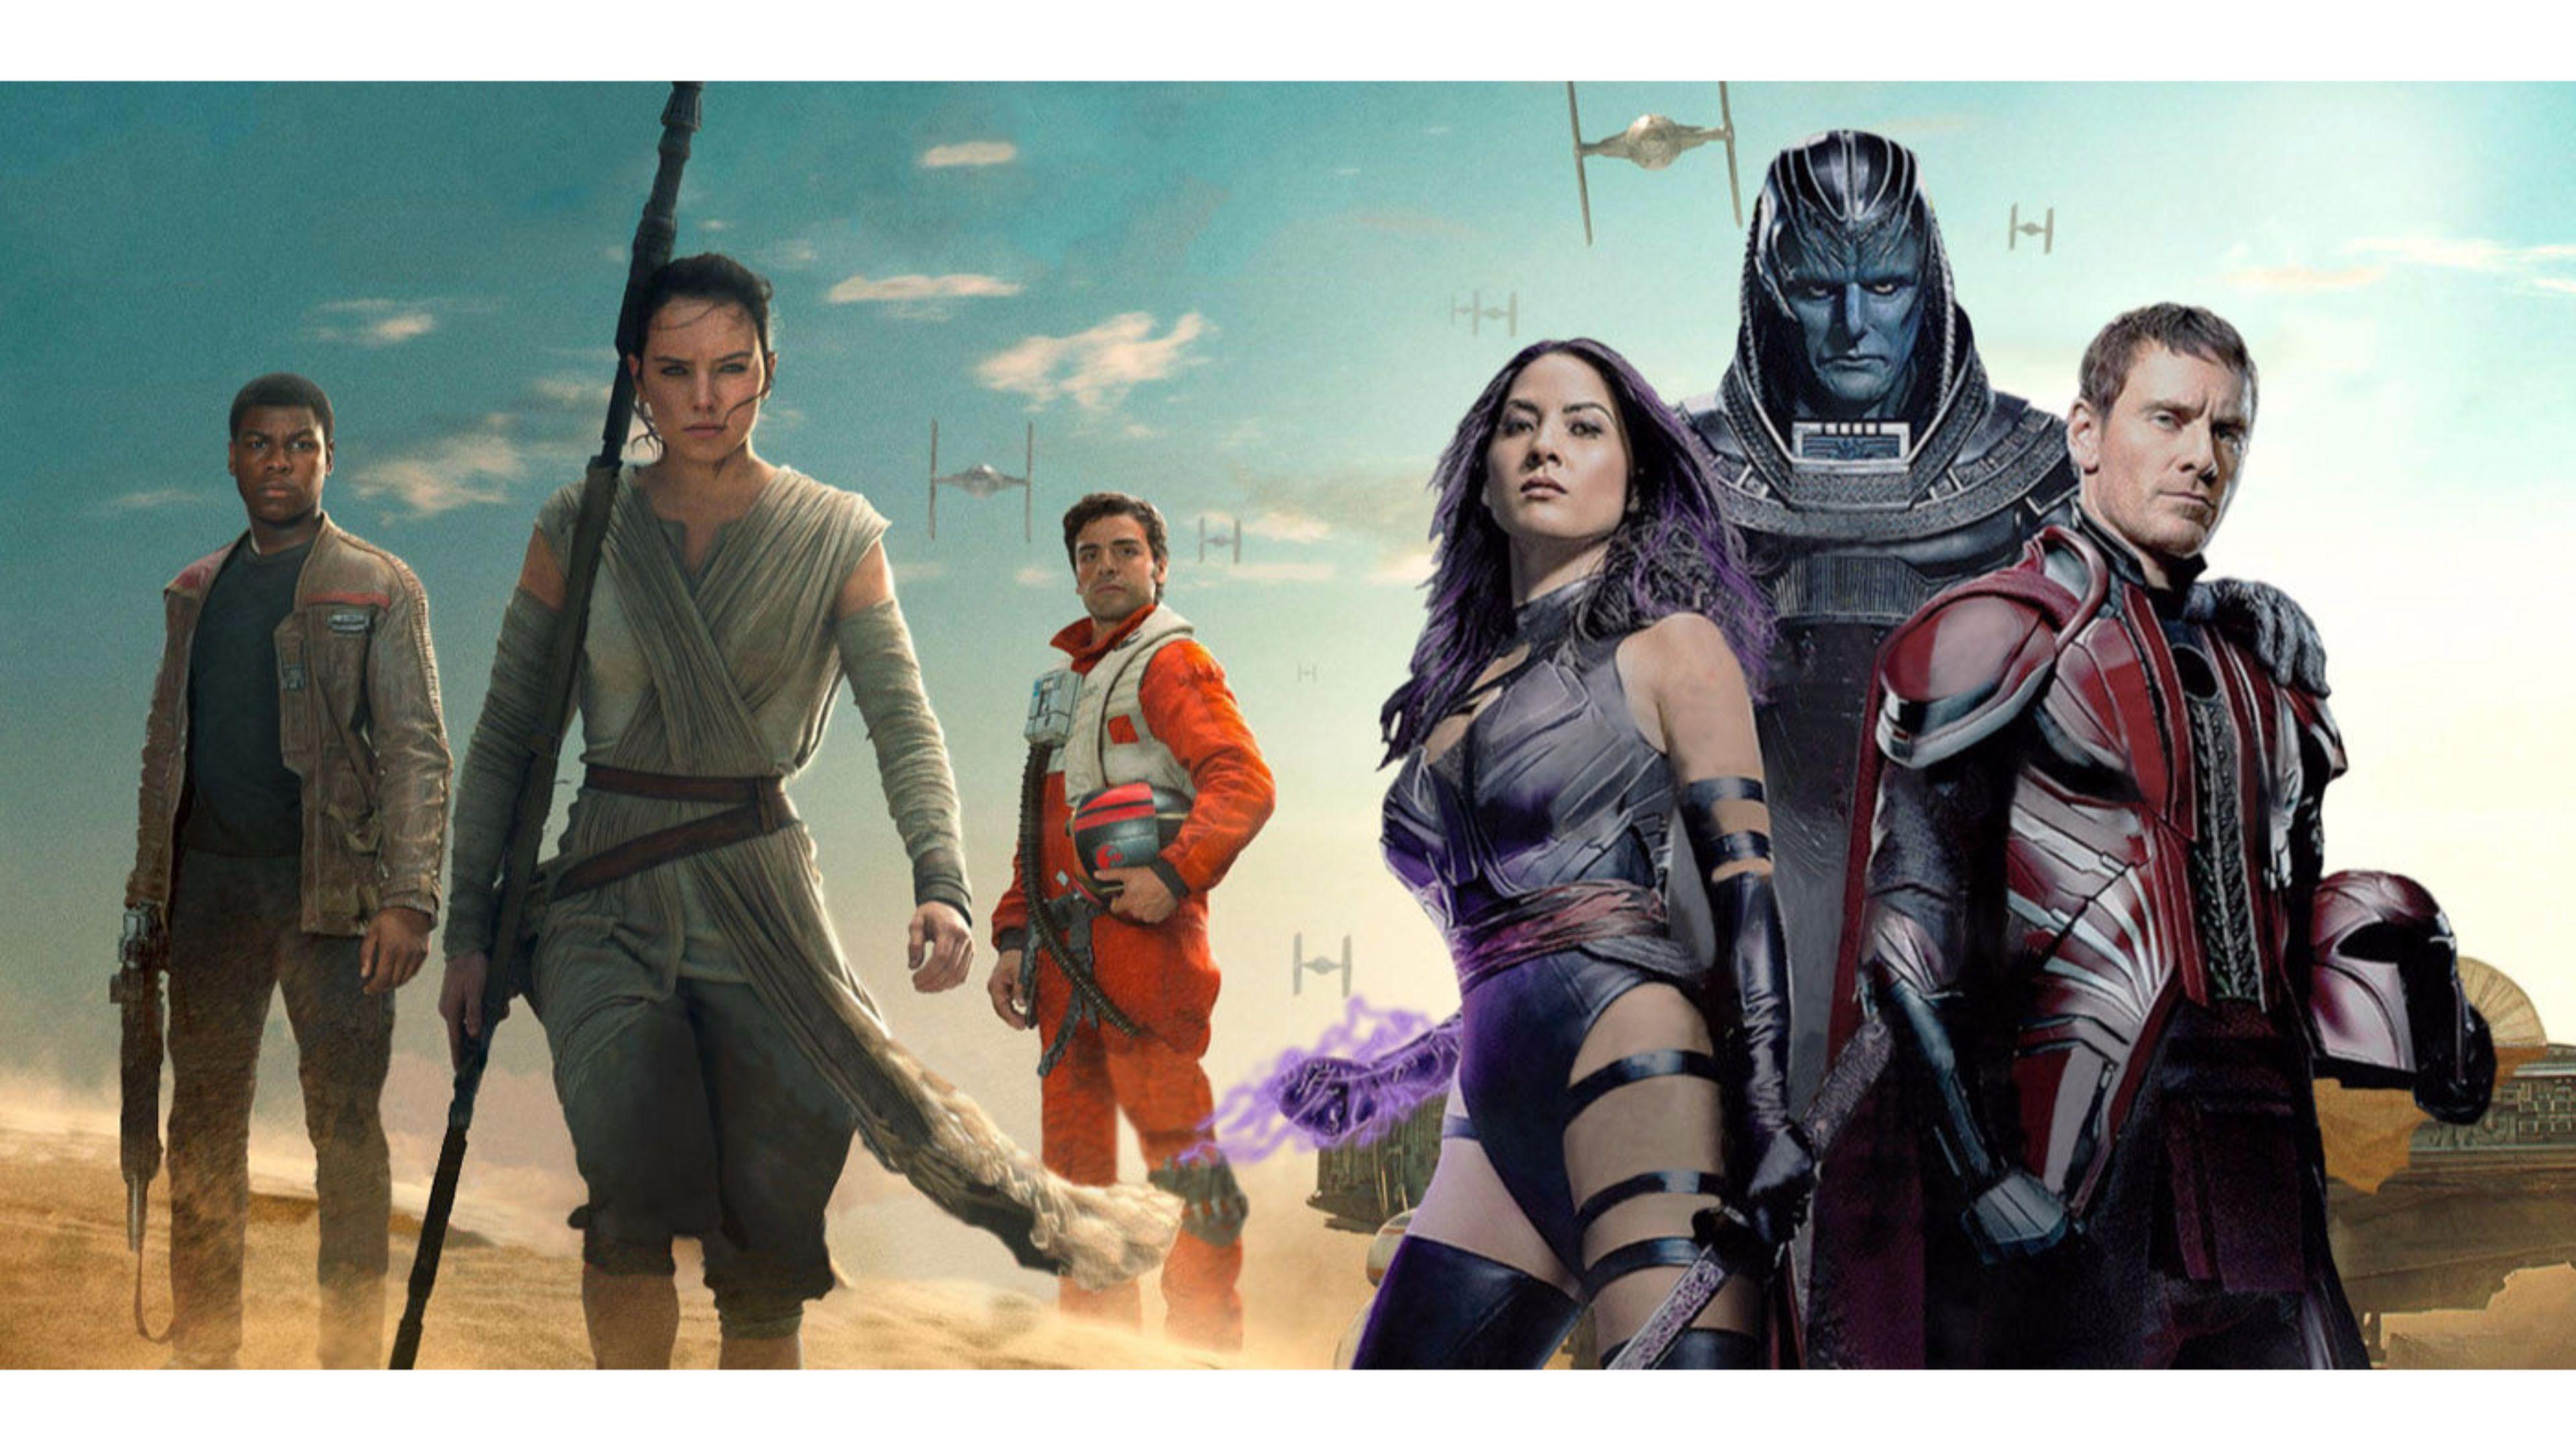 Star Wars And Xmen Apocalypse Movie 4k Wallpaper